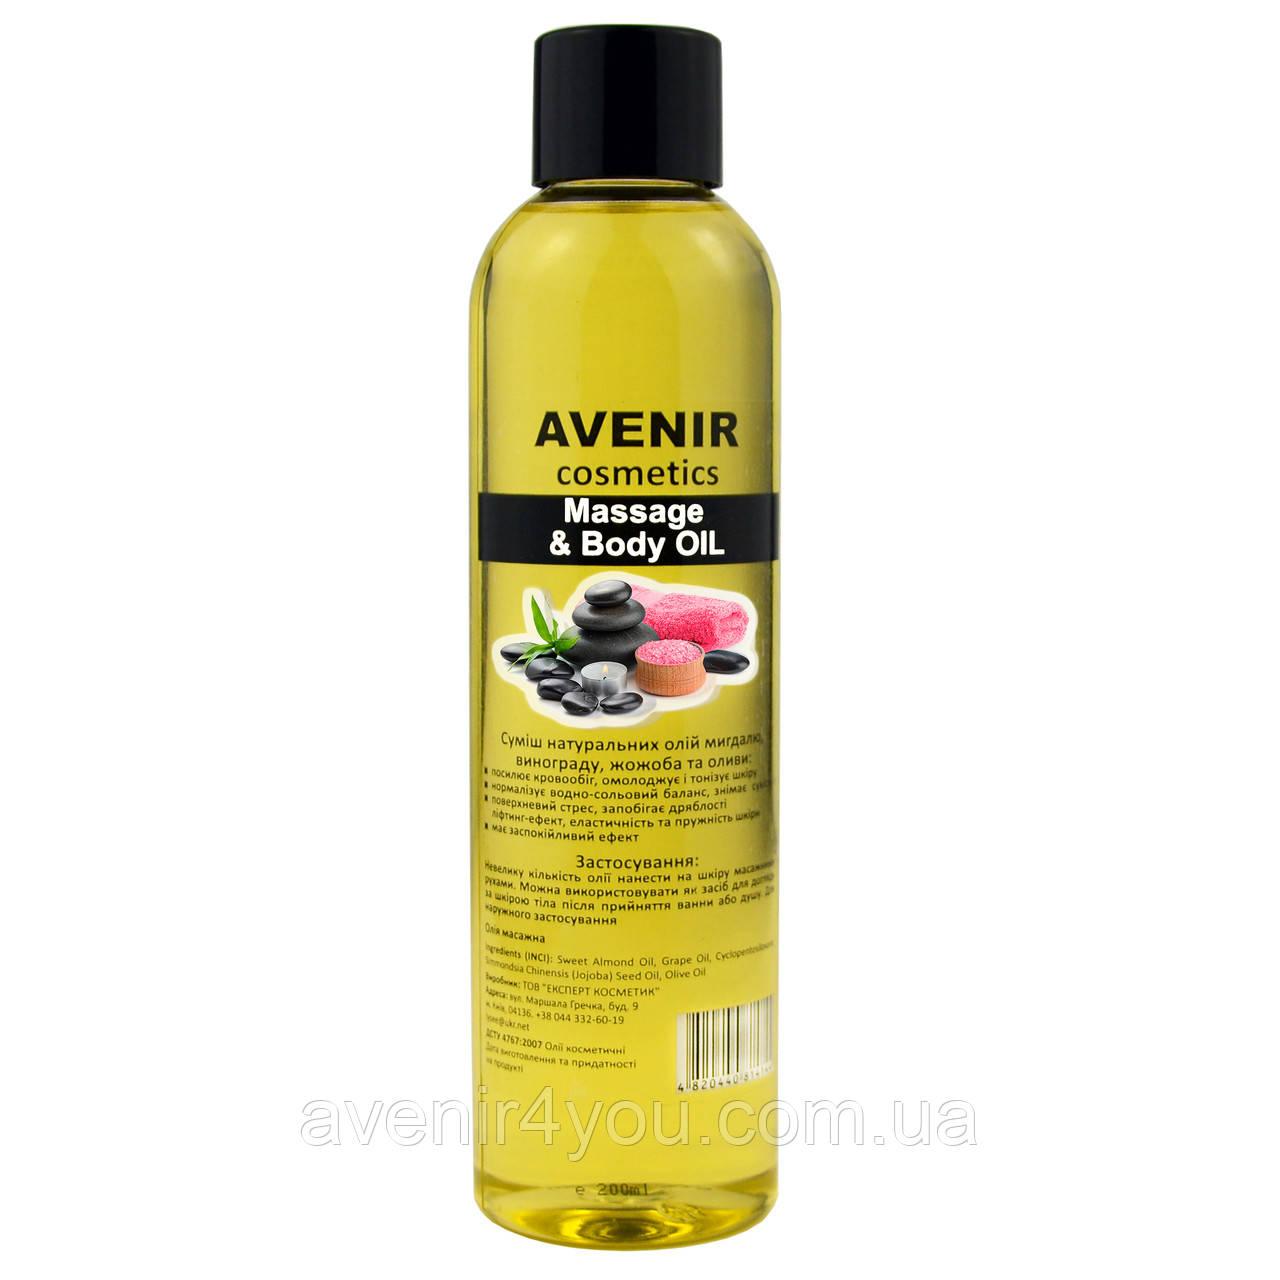 Масажне масло Avenir Cosmetics